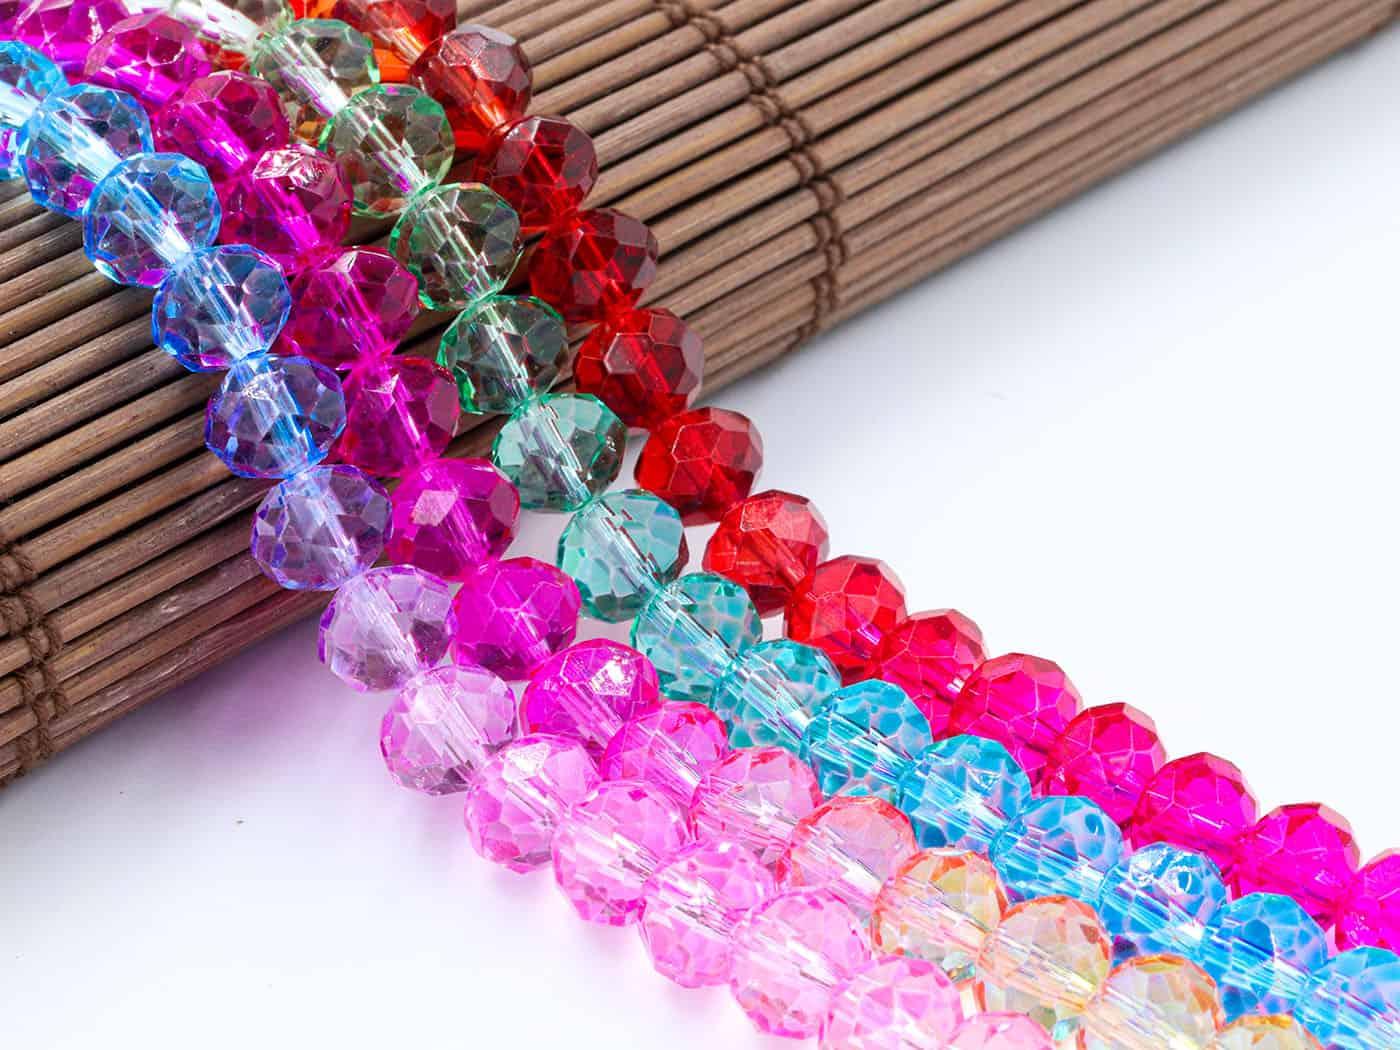 Cristal de Vidro Tie Dye Hawaí 6mm - 90 cristais - CV518  - ArtStones